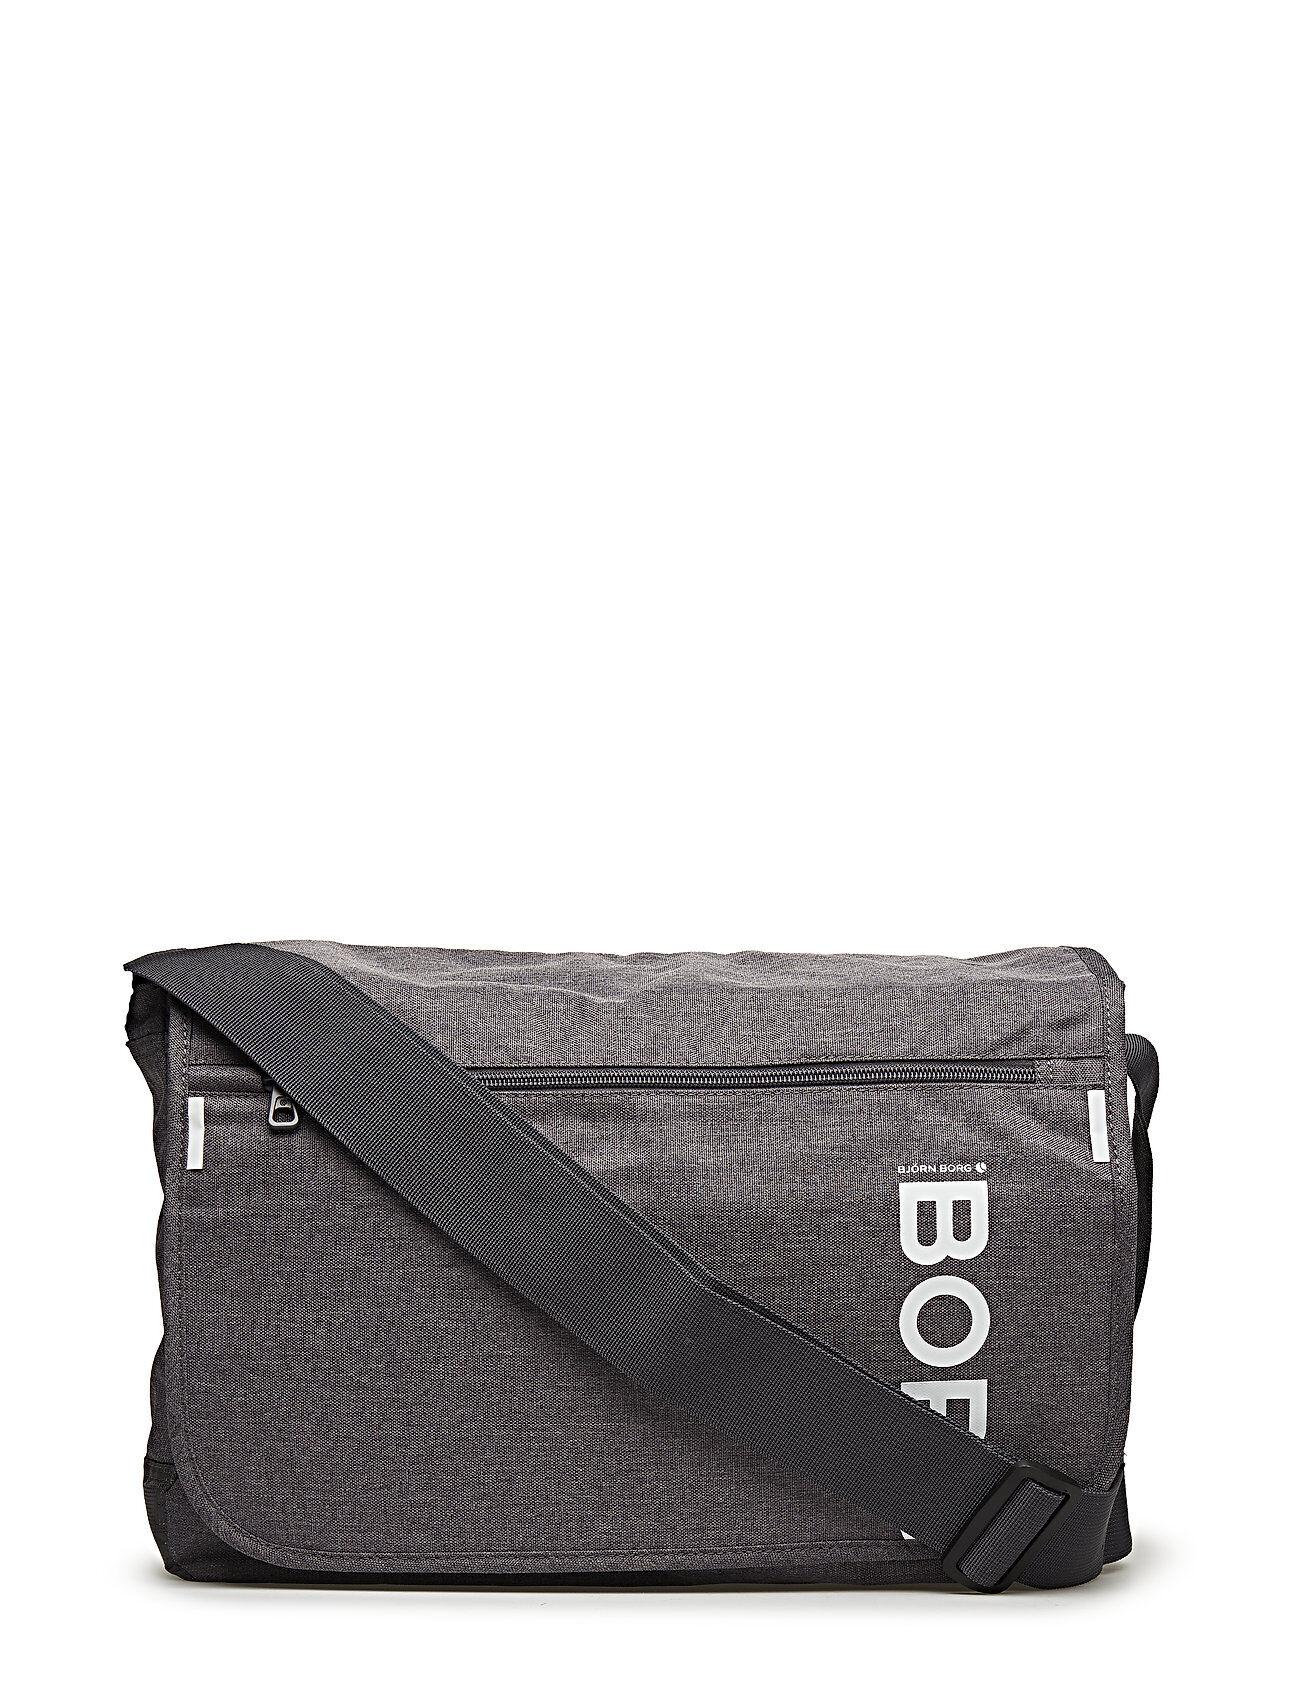 Björn Borg Bags Flyer Low